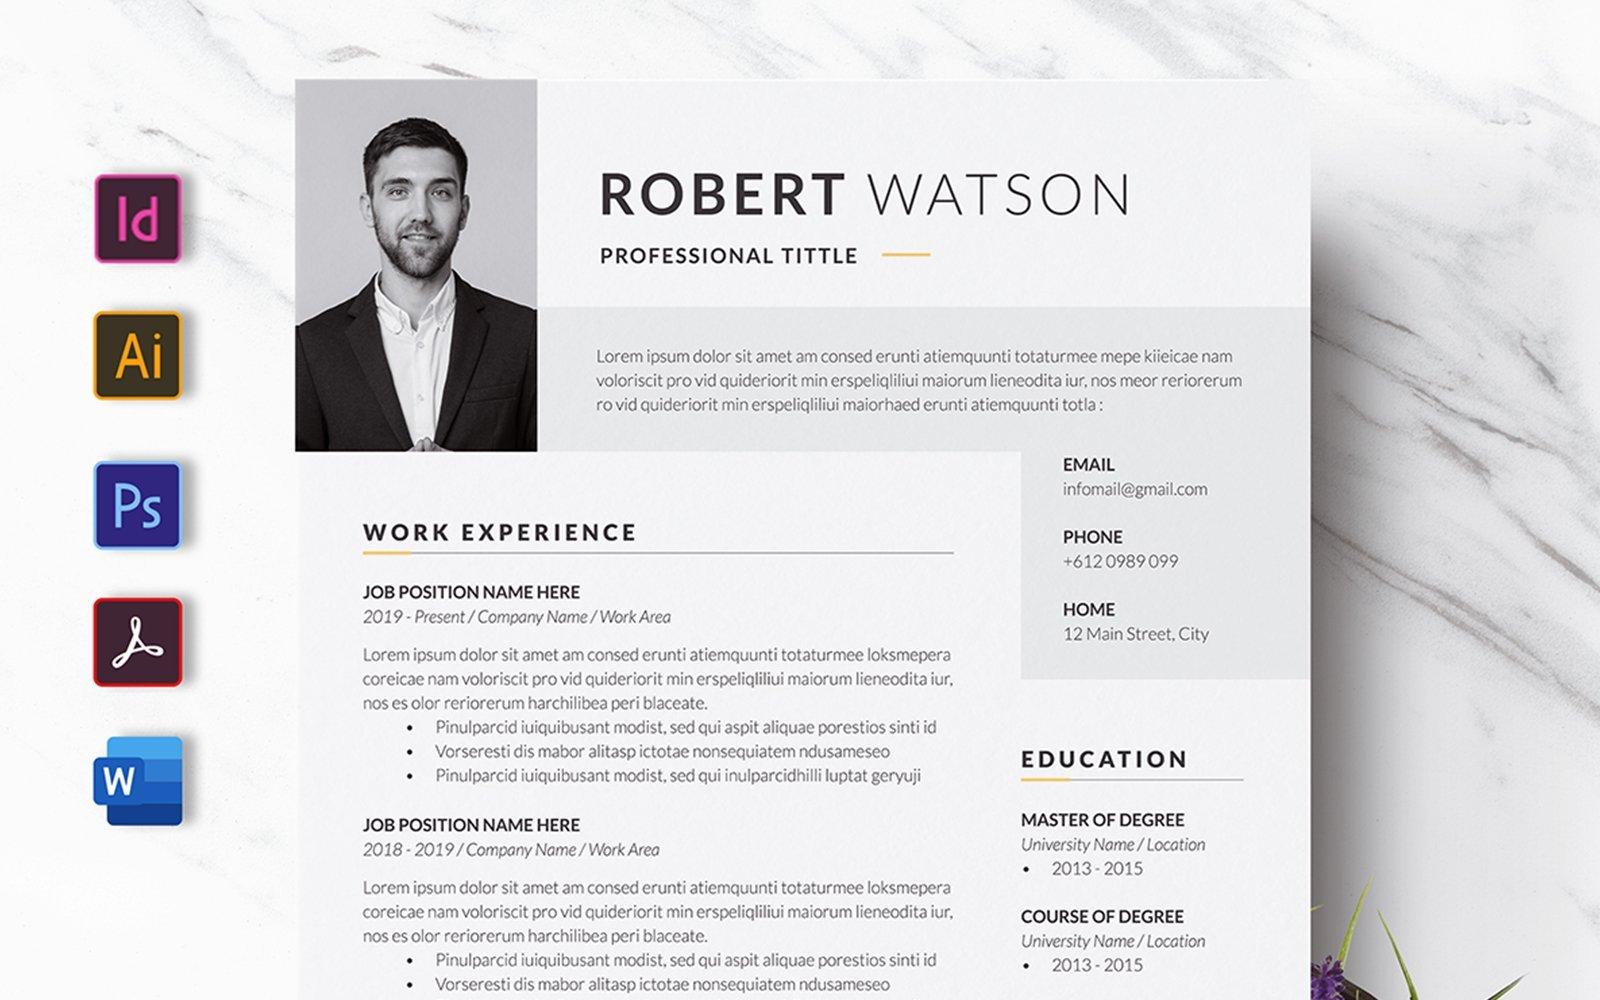 Monochrome CV Resume Template